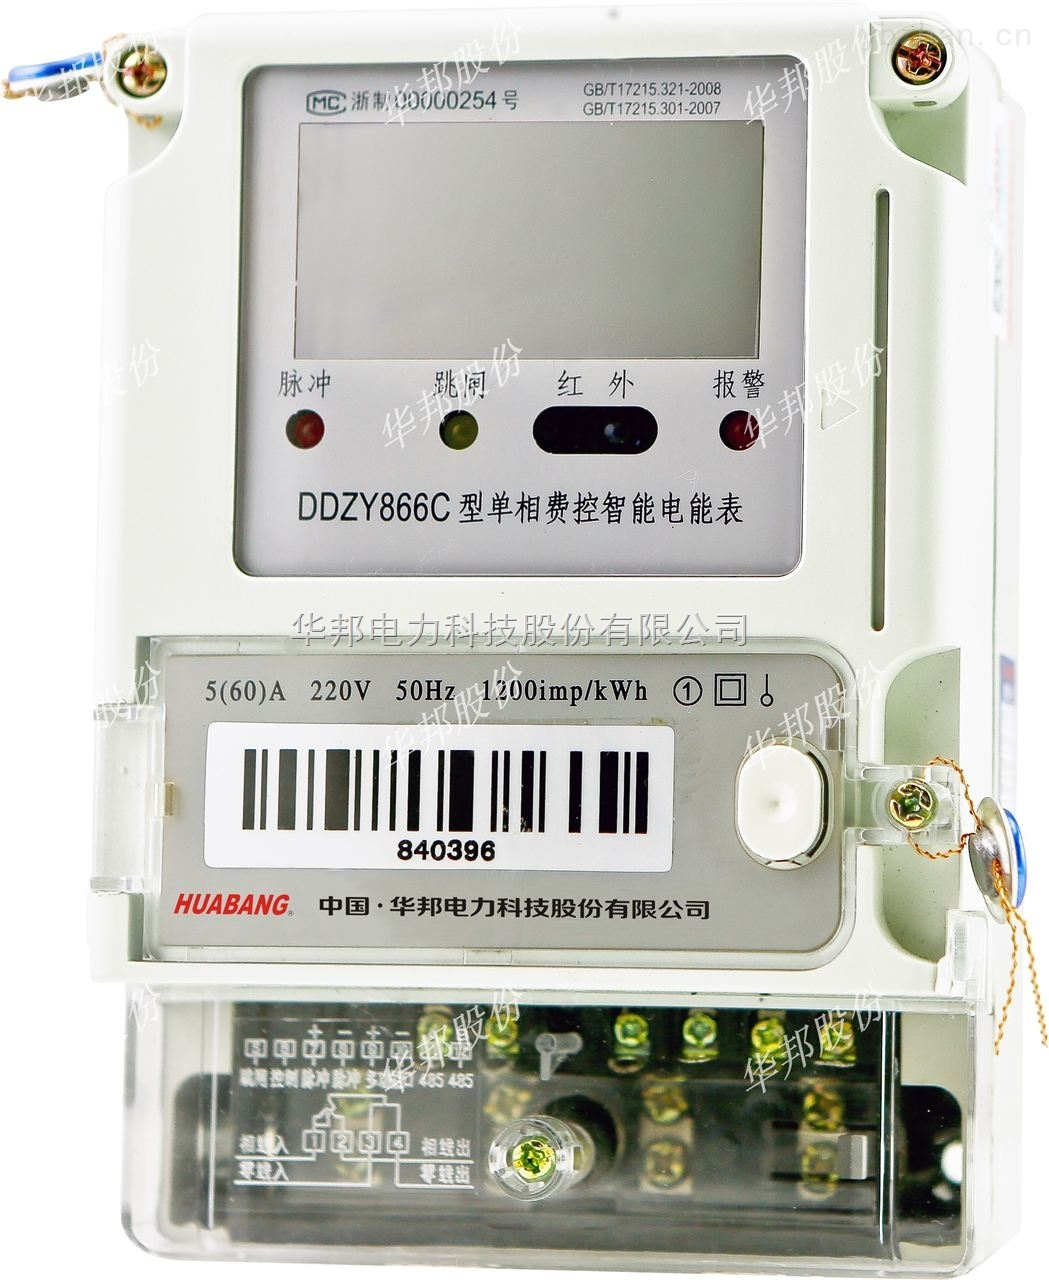 DDZY866C-Z-智能電表遠程抄表